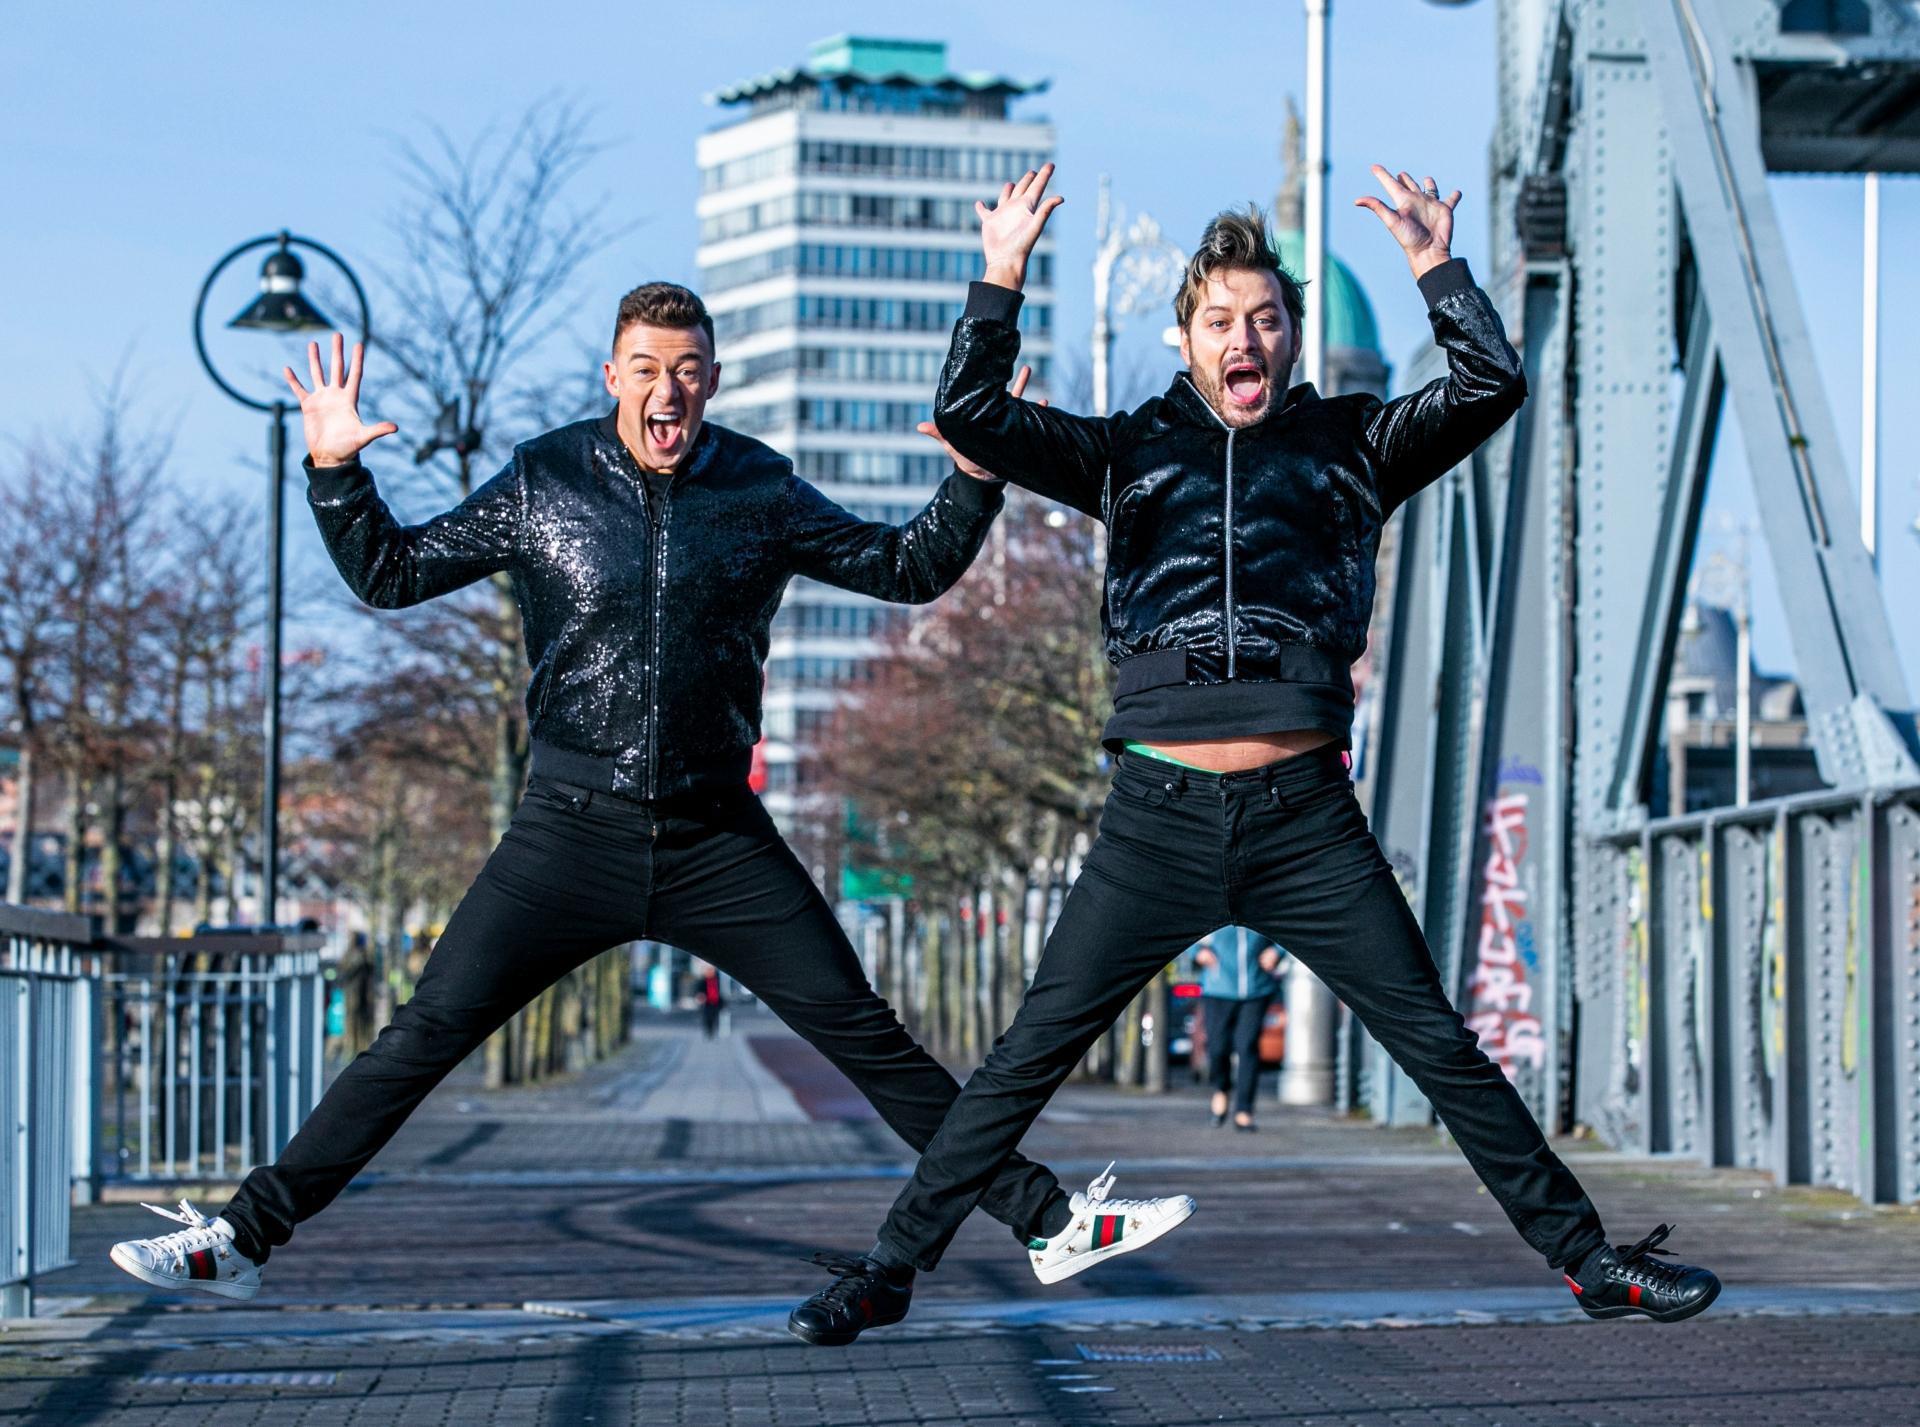 Kildare dating - Ireland: GayXchange - Gay chat network